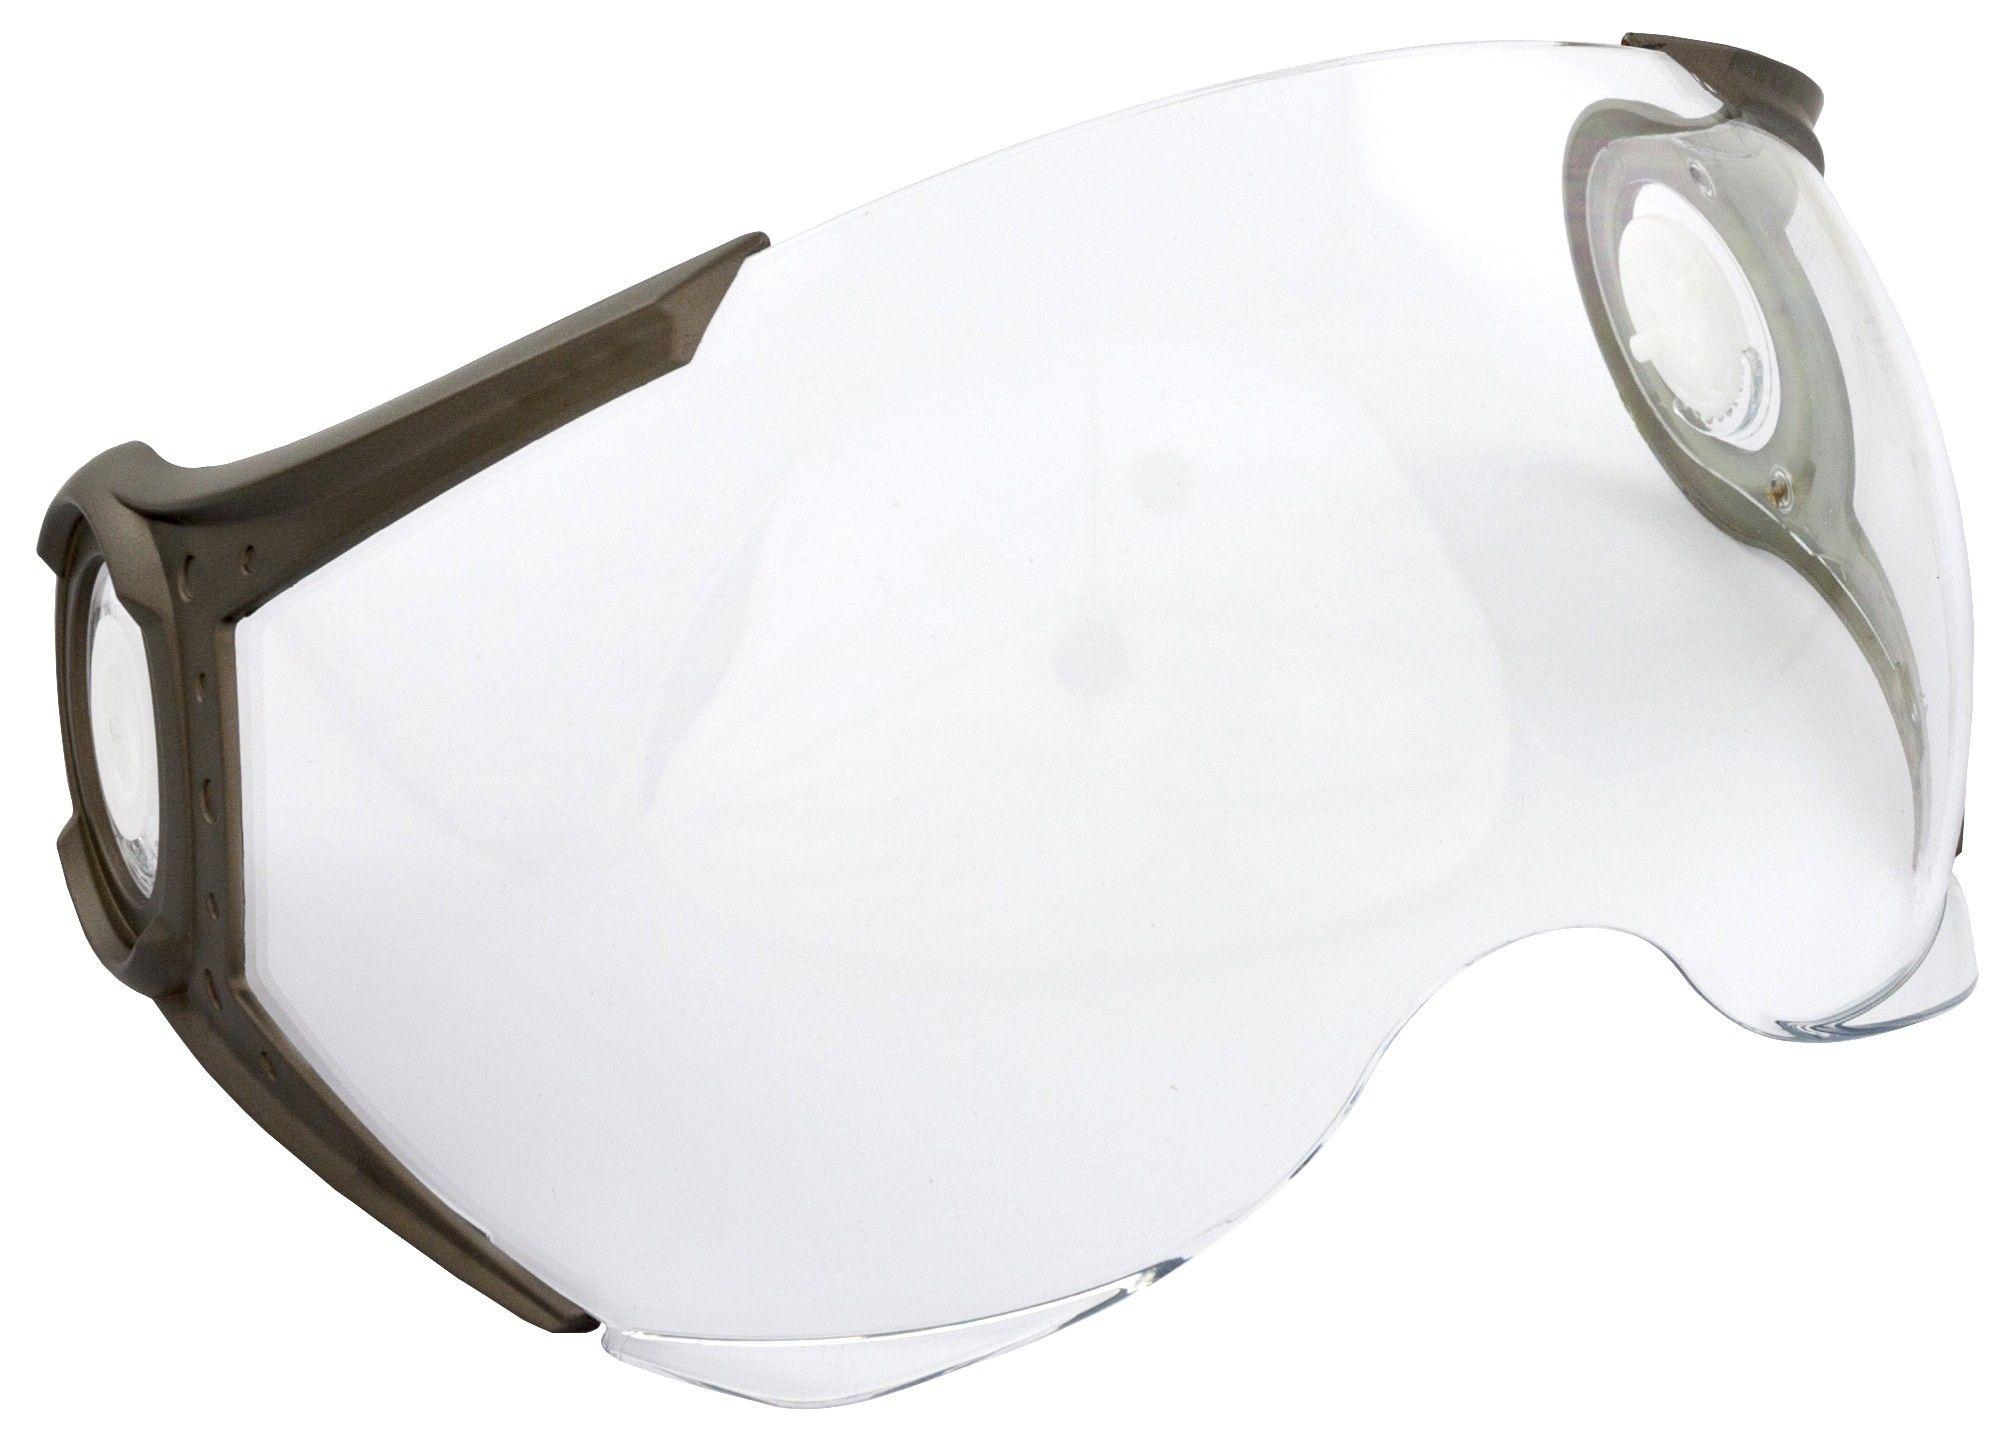 【GSB】G-247 四分之三安全帽用風鏡 - 「Webike-摩托百貨」